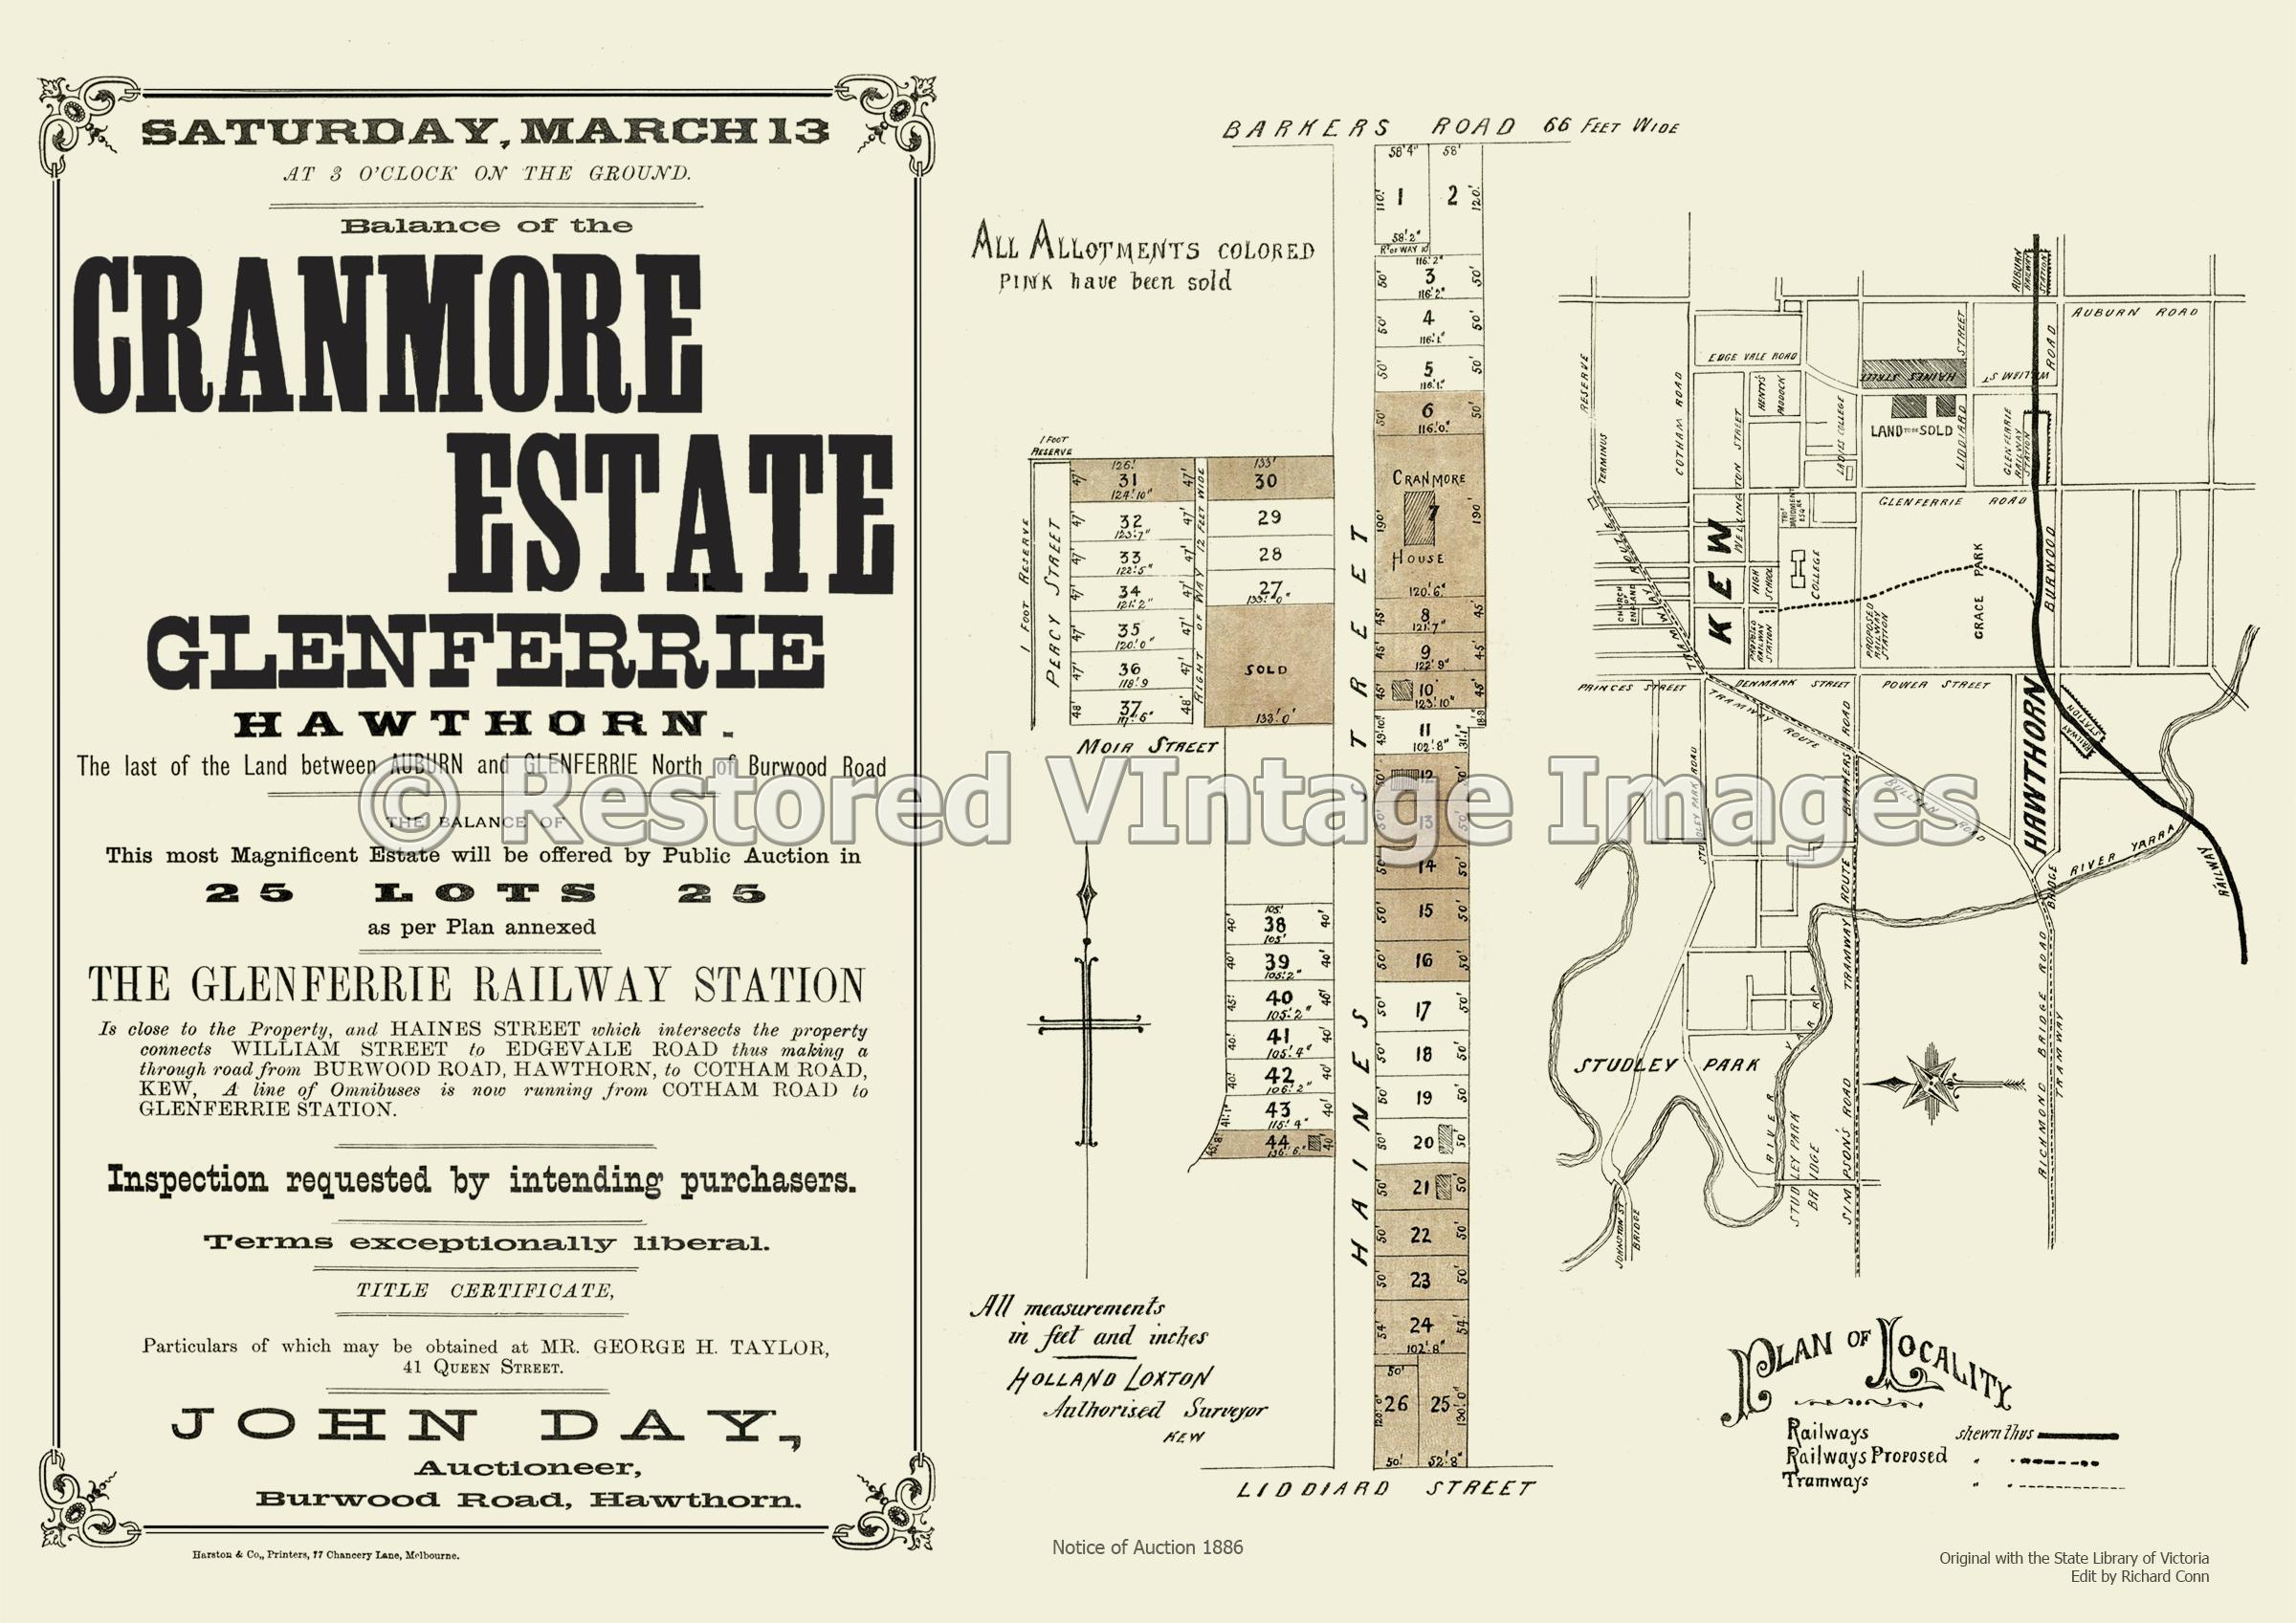 Cranmore Estate Glenferrie 13th March 1886 – Hawthorn